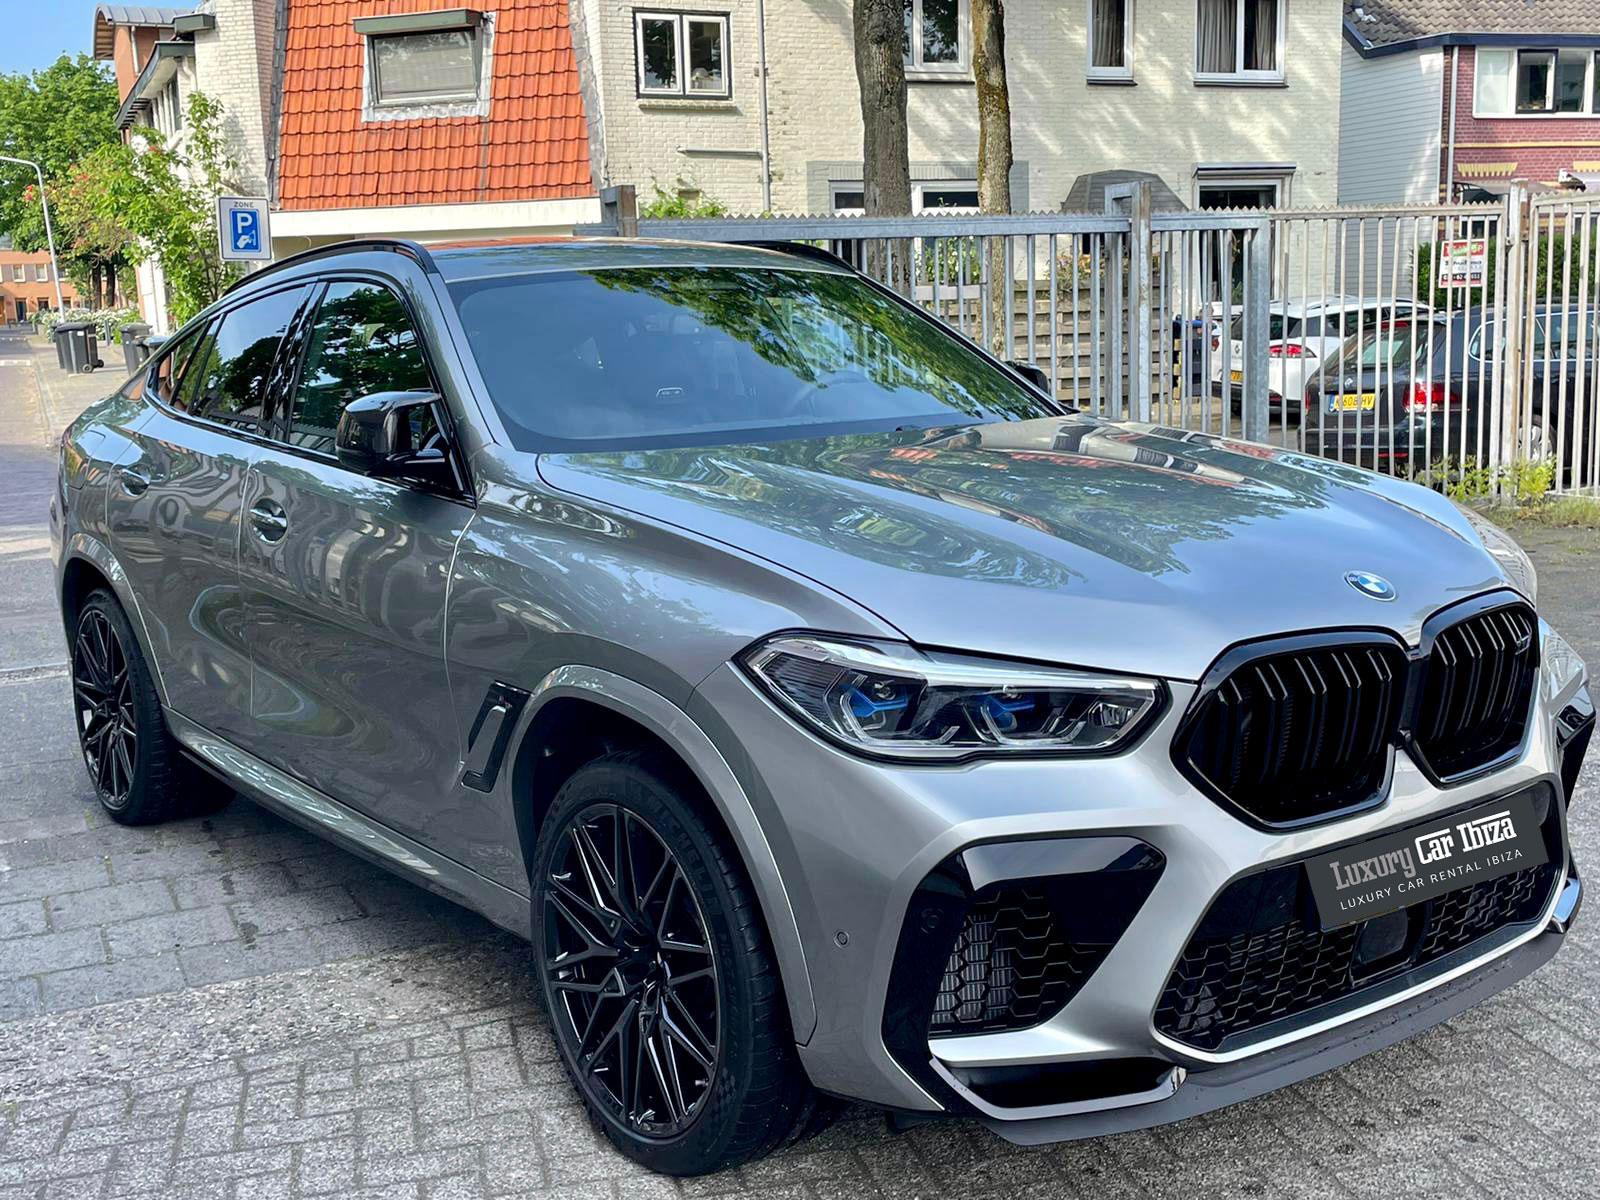 BMW-X6-Competition-Rental-Ibiza